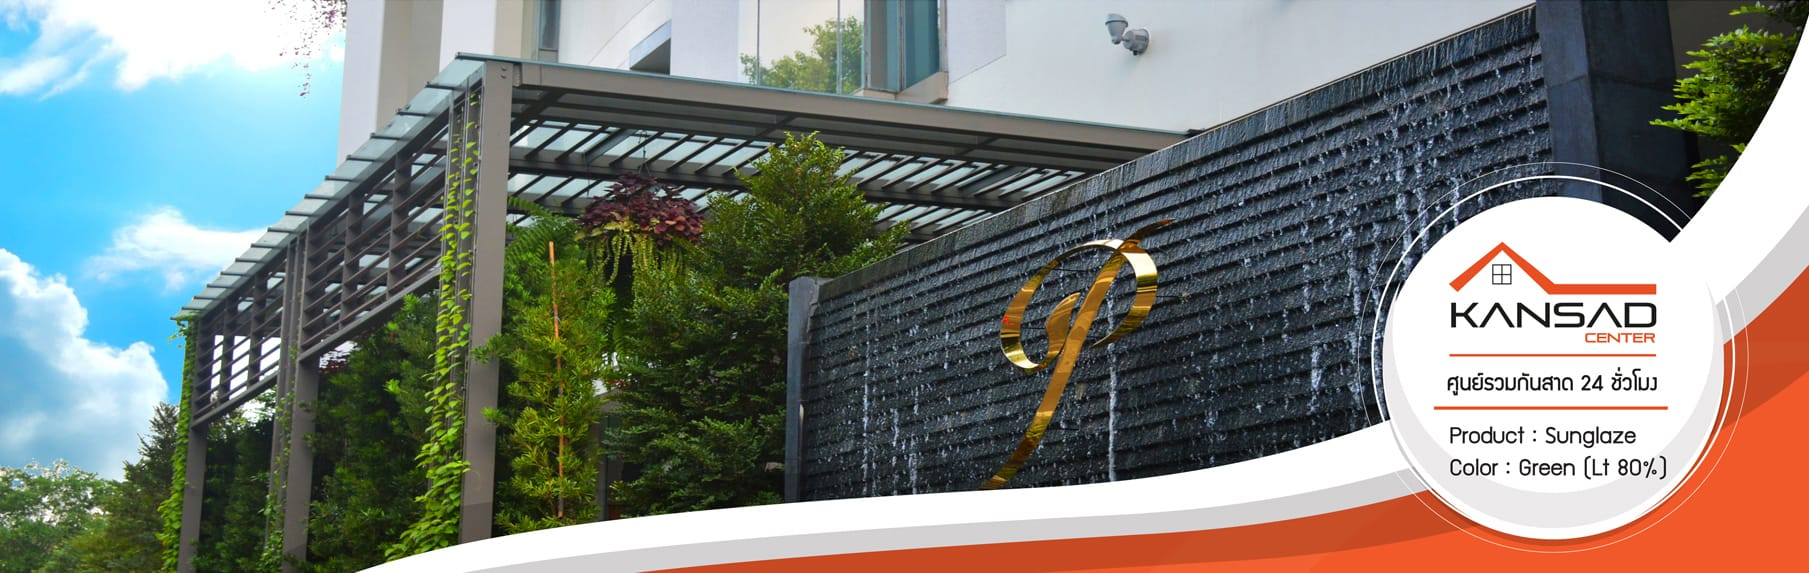 Sunglaze banner